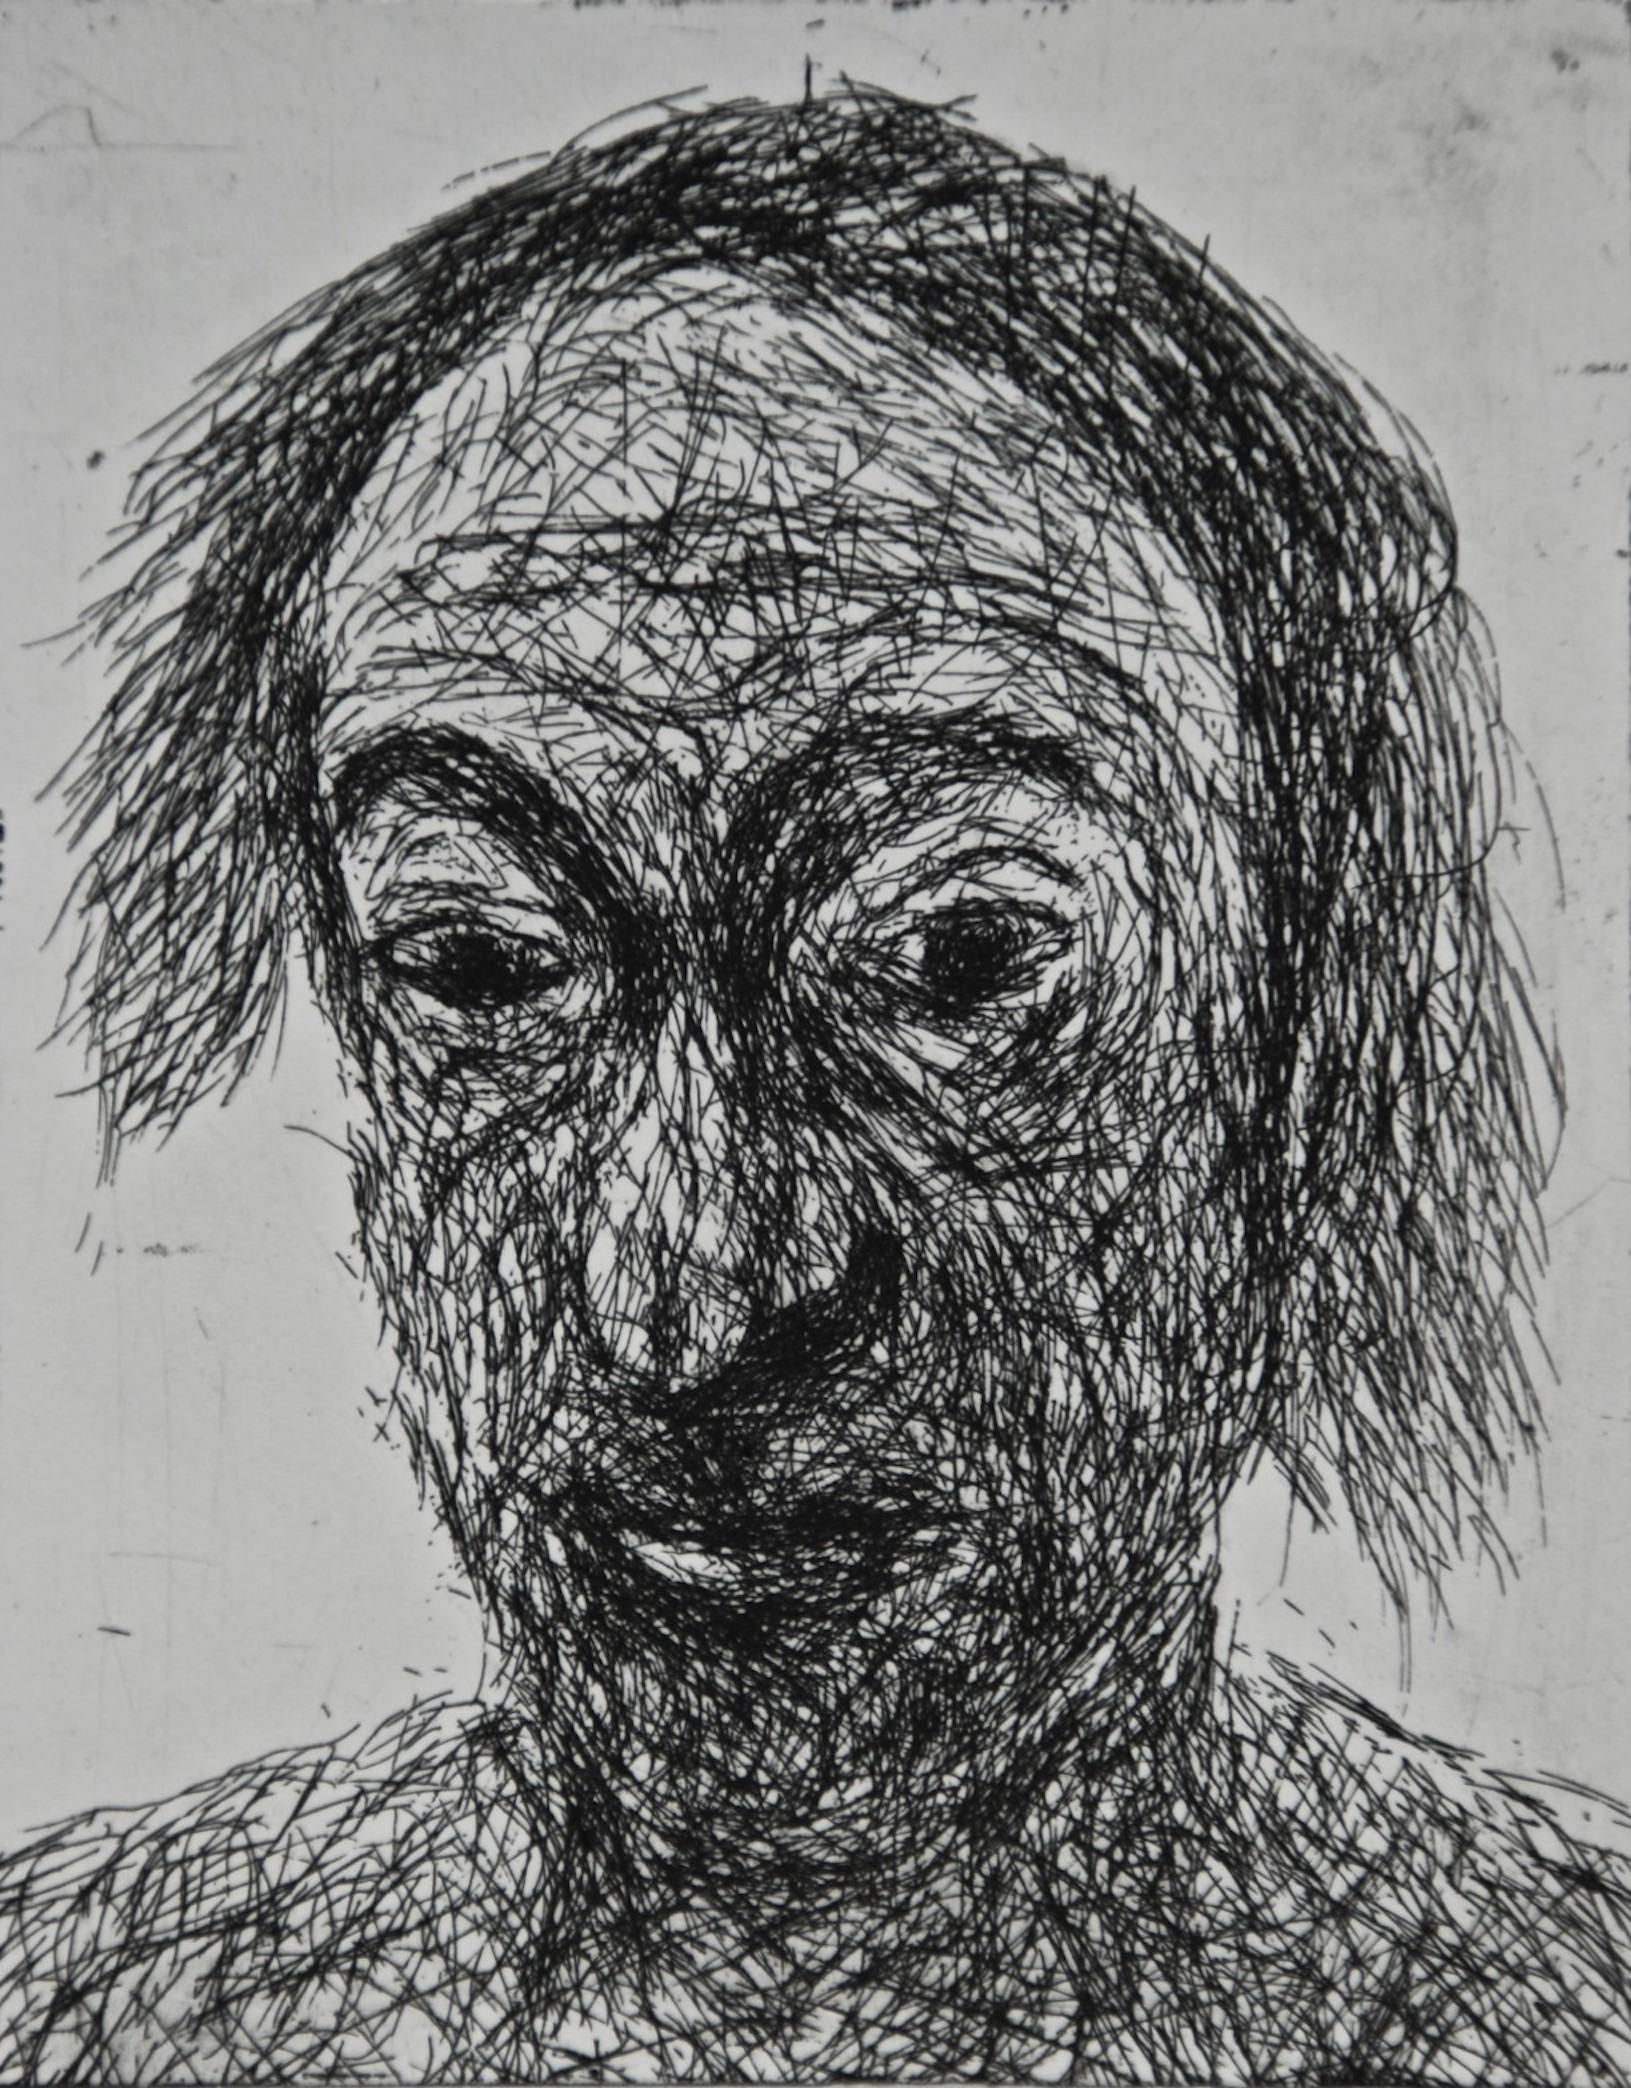 Mood 28, multi-states etching, 12.5 x 10 cm